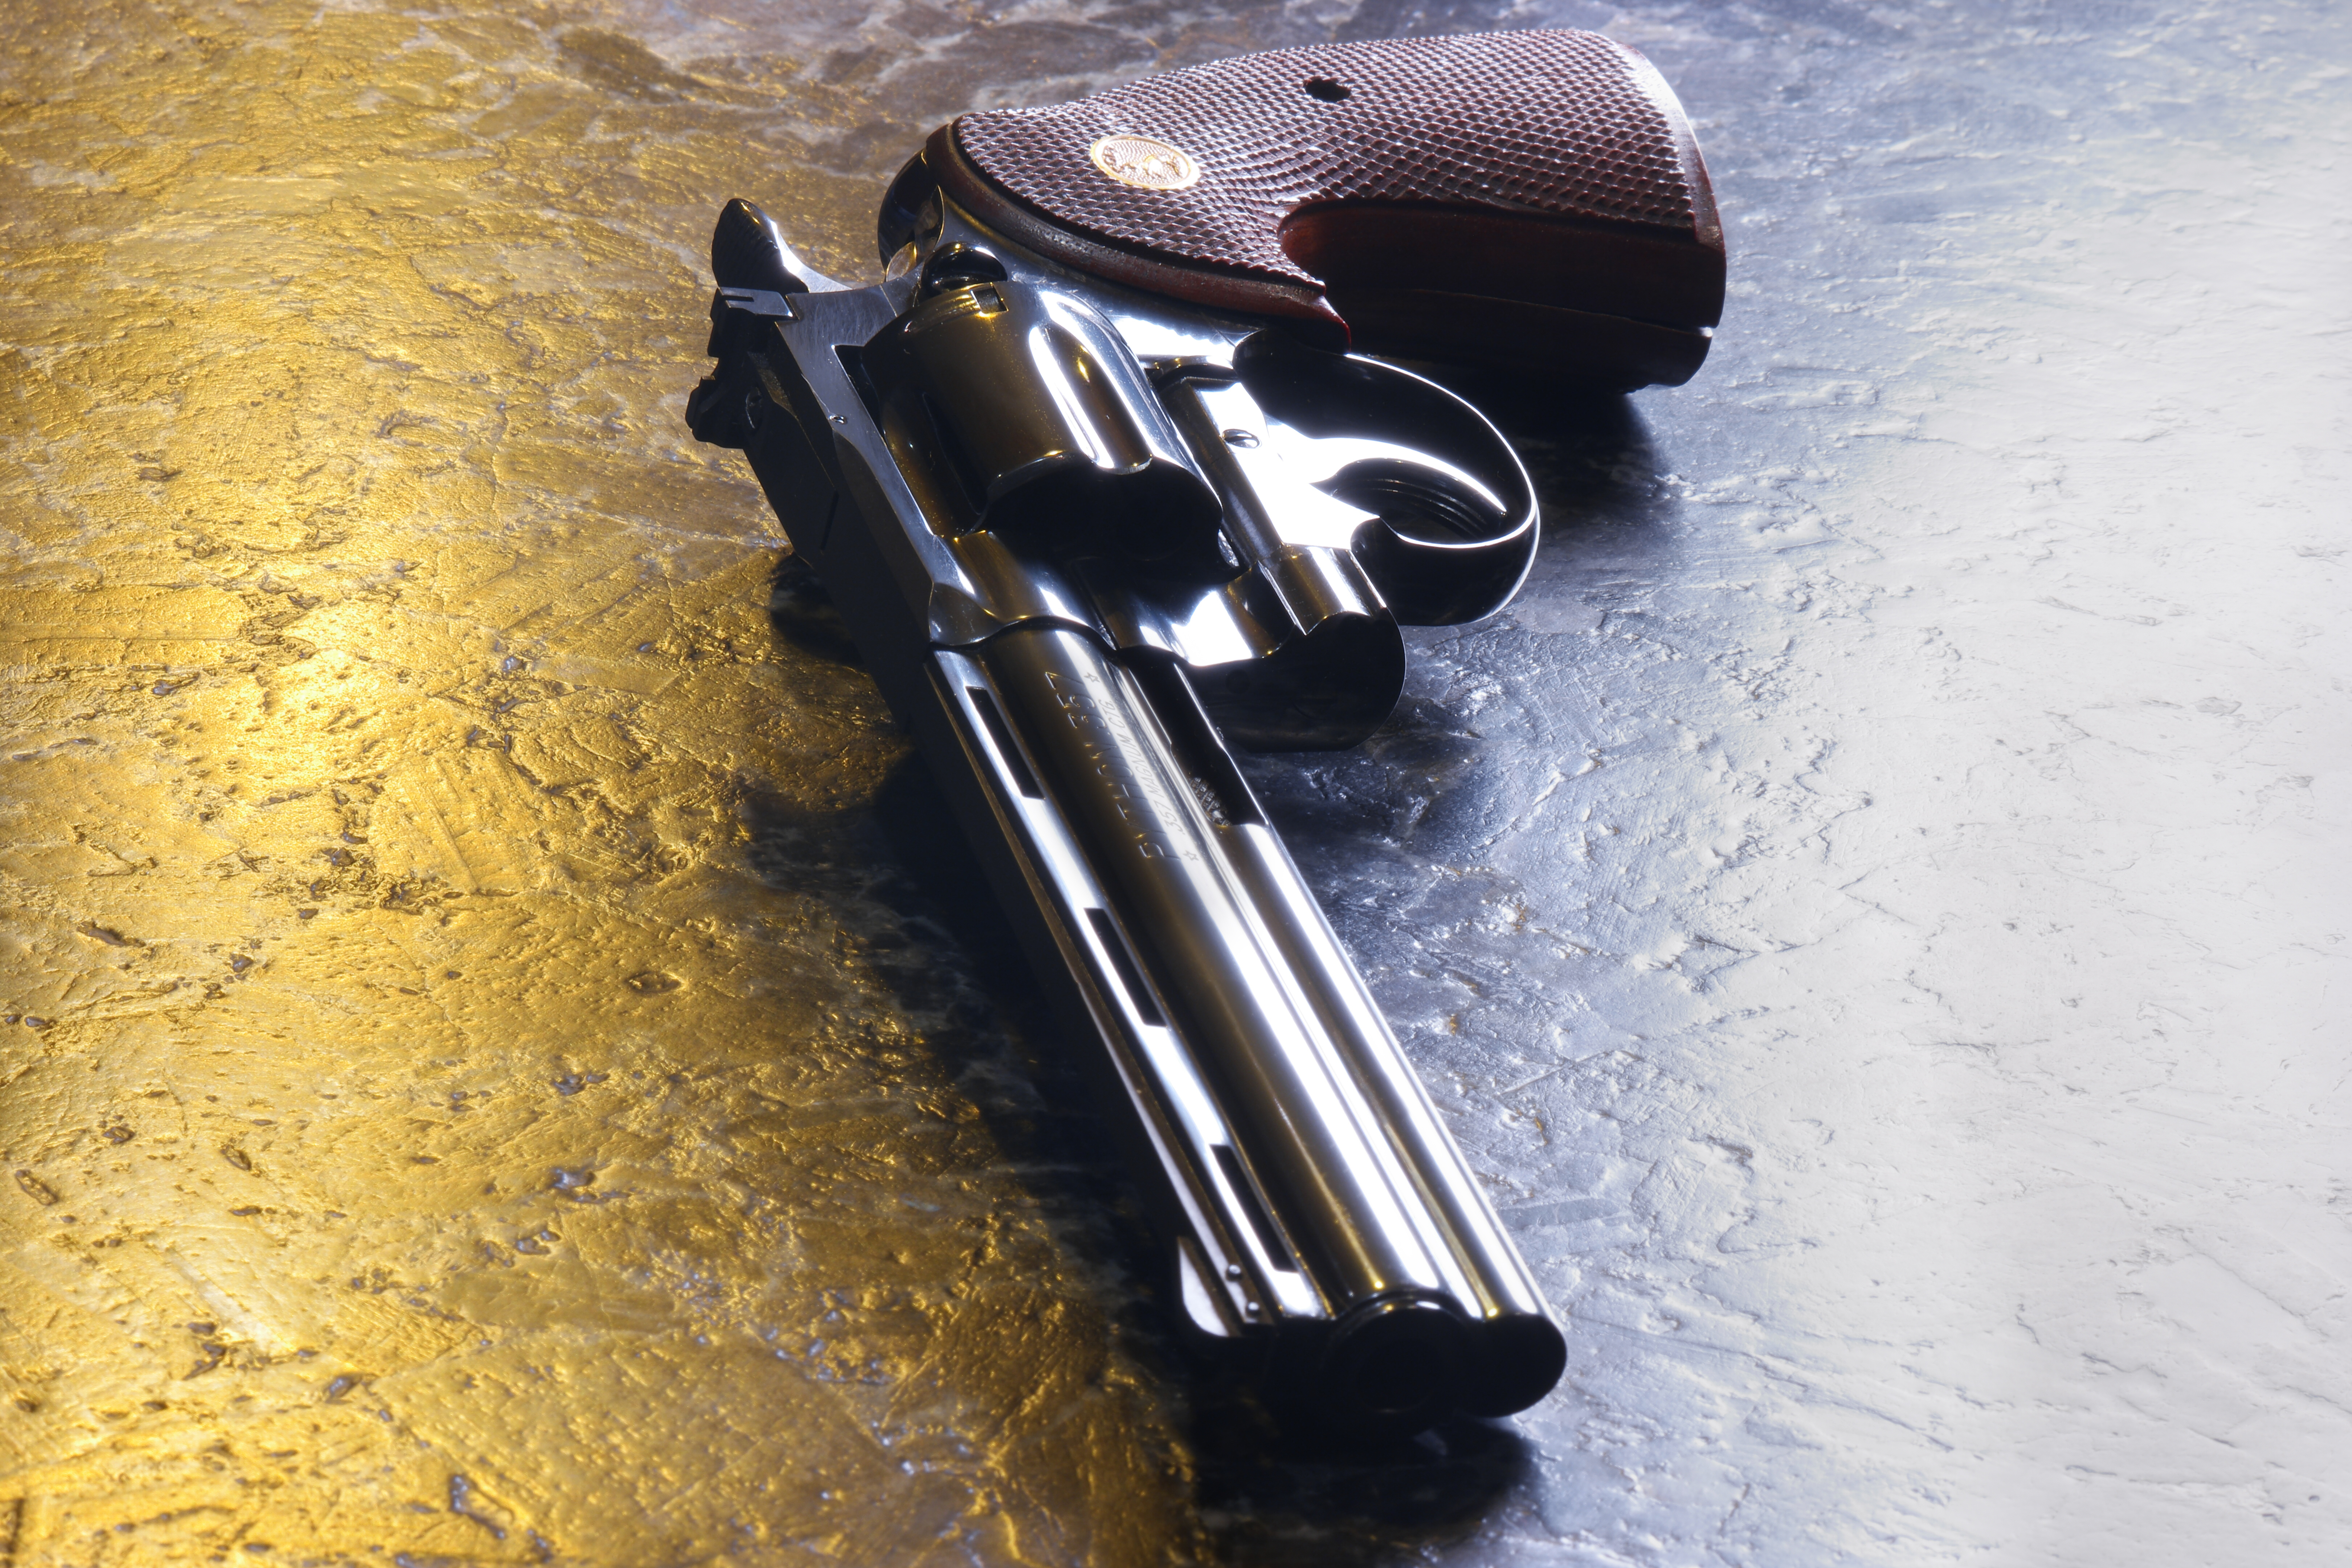 File:1959 Colt Python (19312940429) jpg - Wikimedia Commons